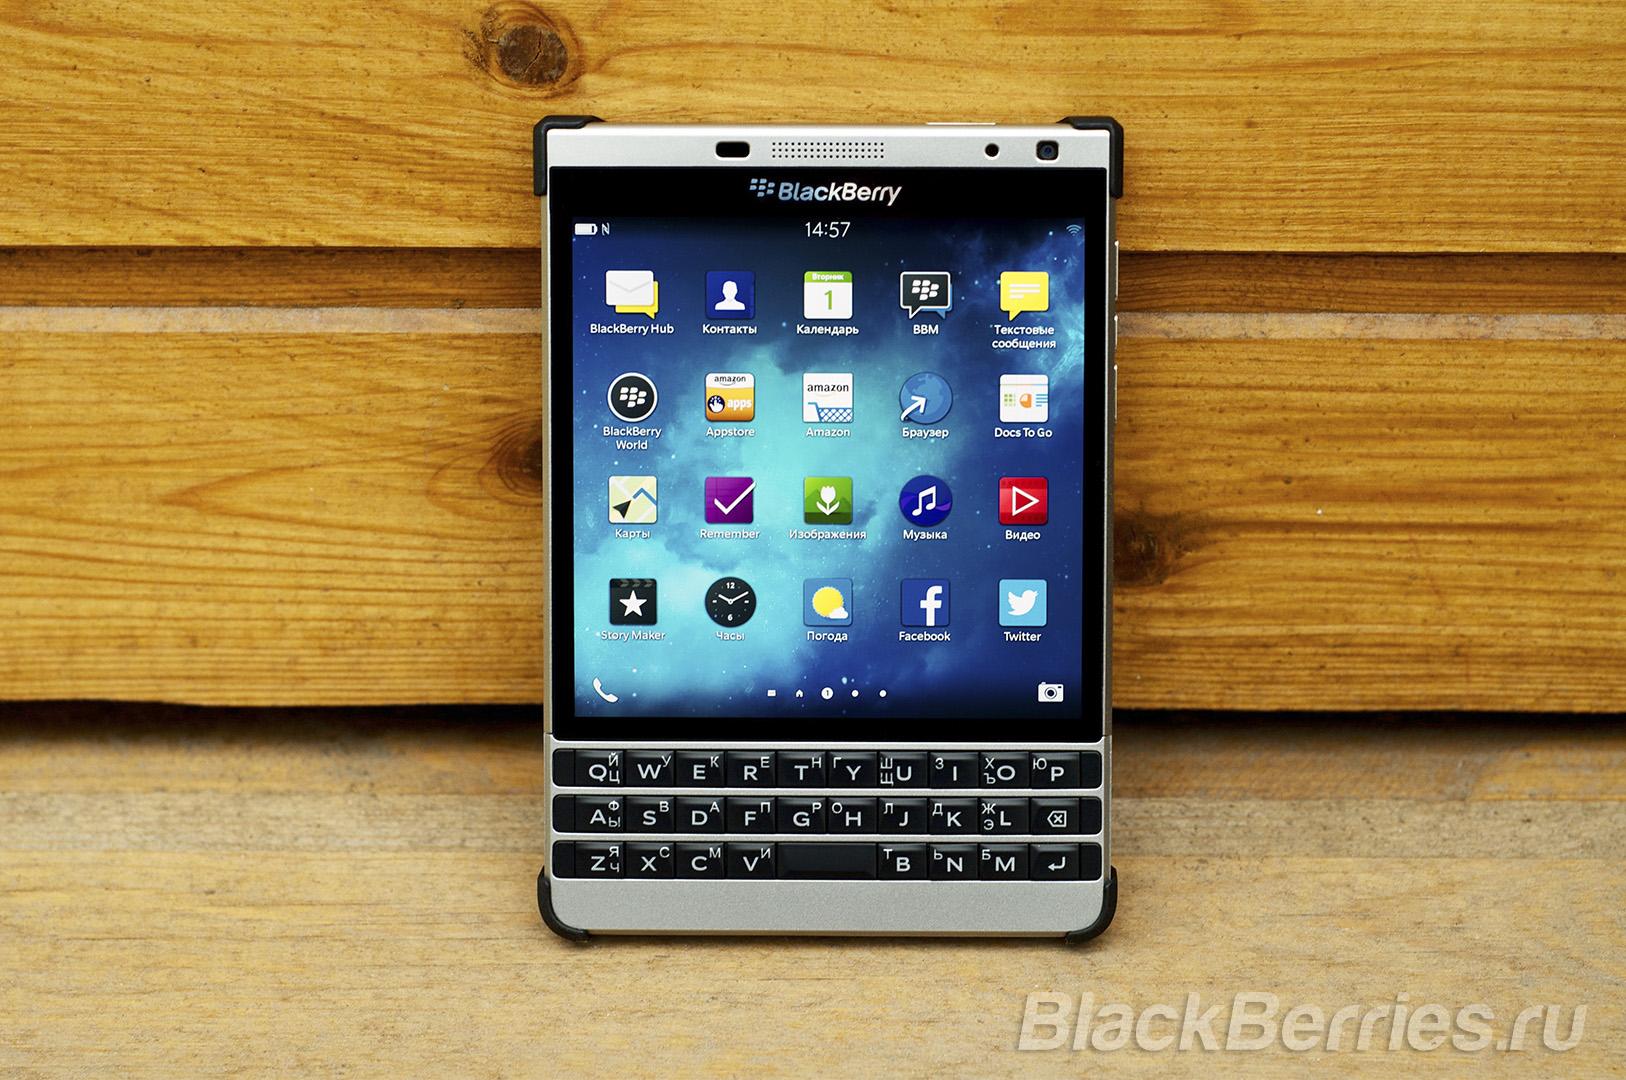 BlackBerry-Passport-Silver-Edition-Cases-01